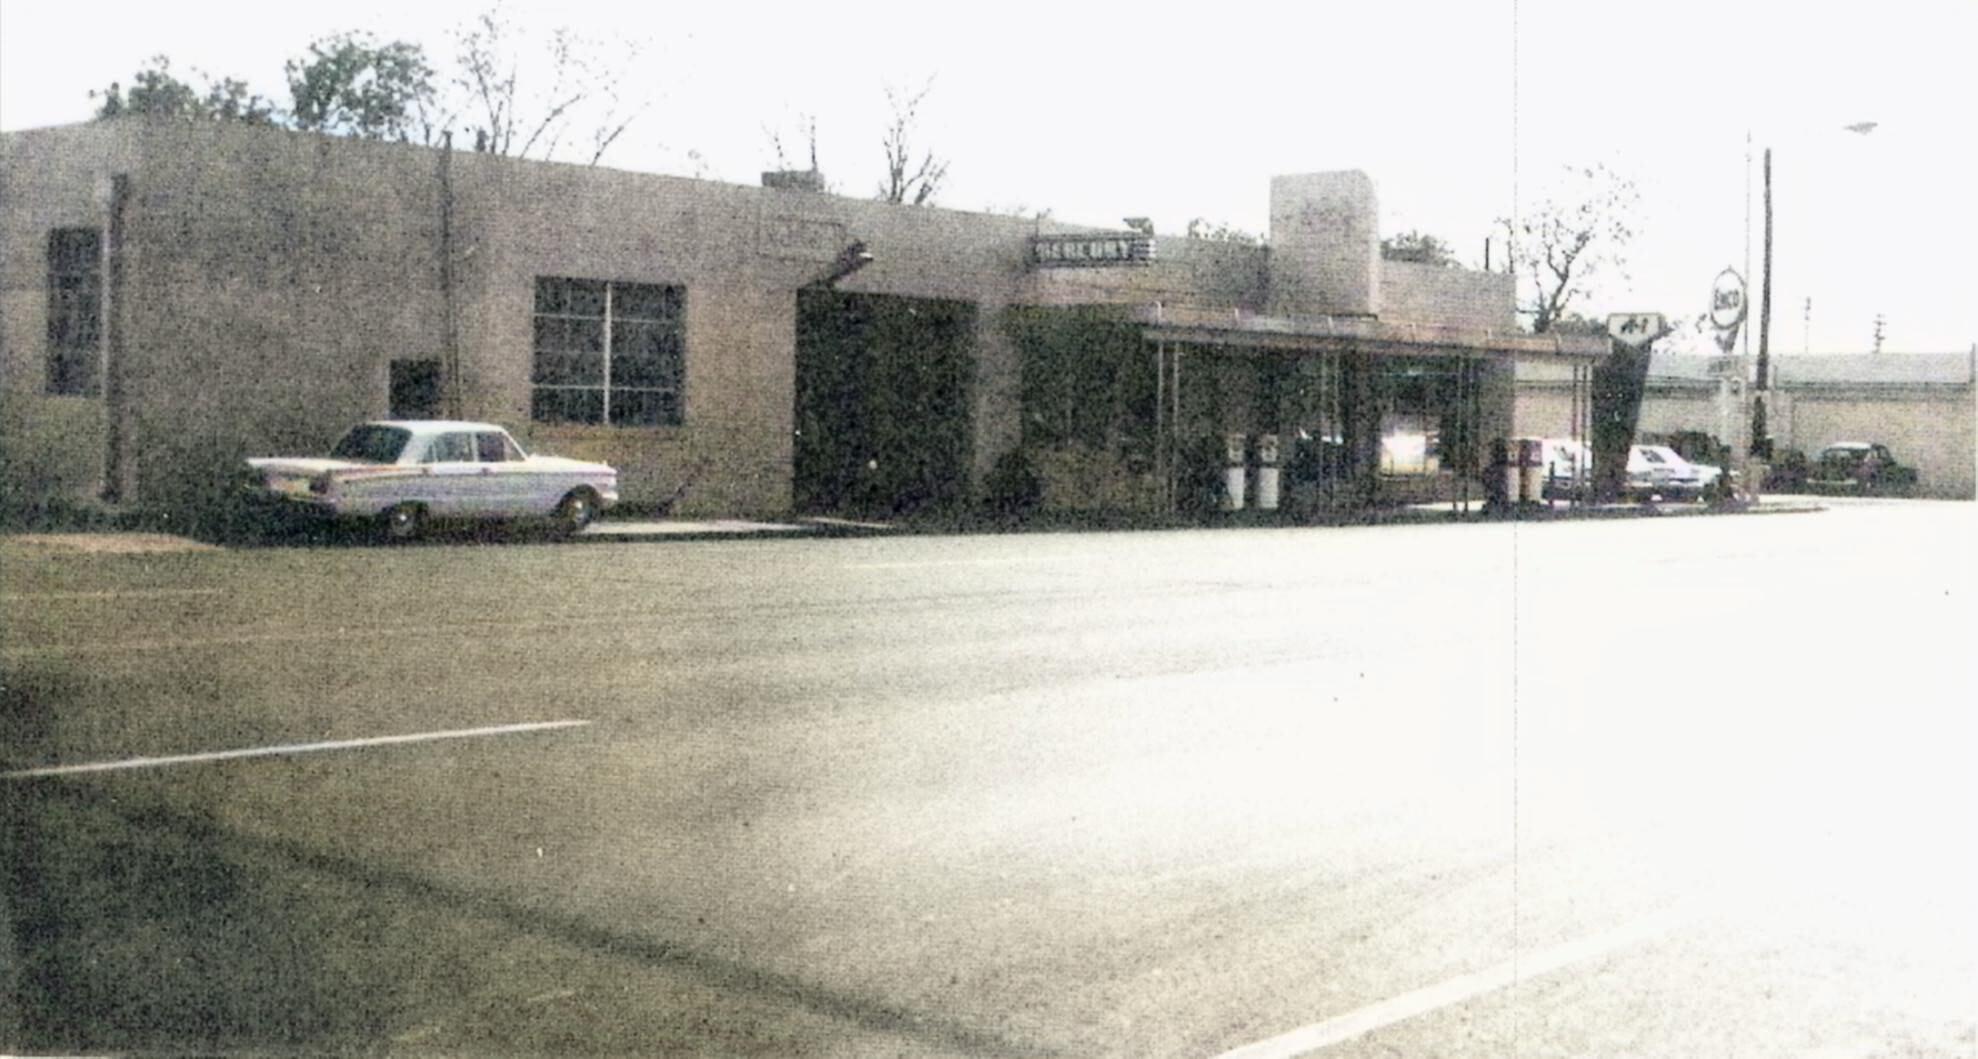 Ford Dealership in Hempstead